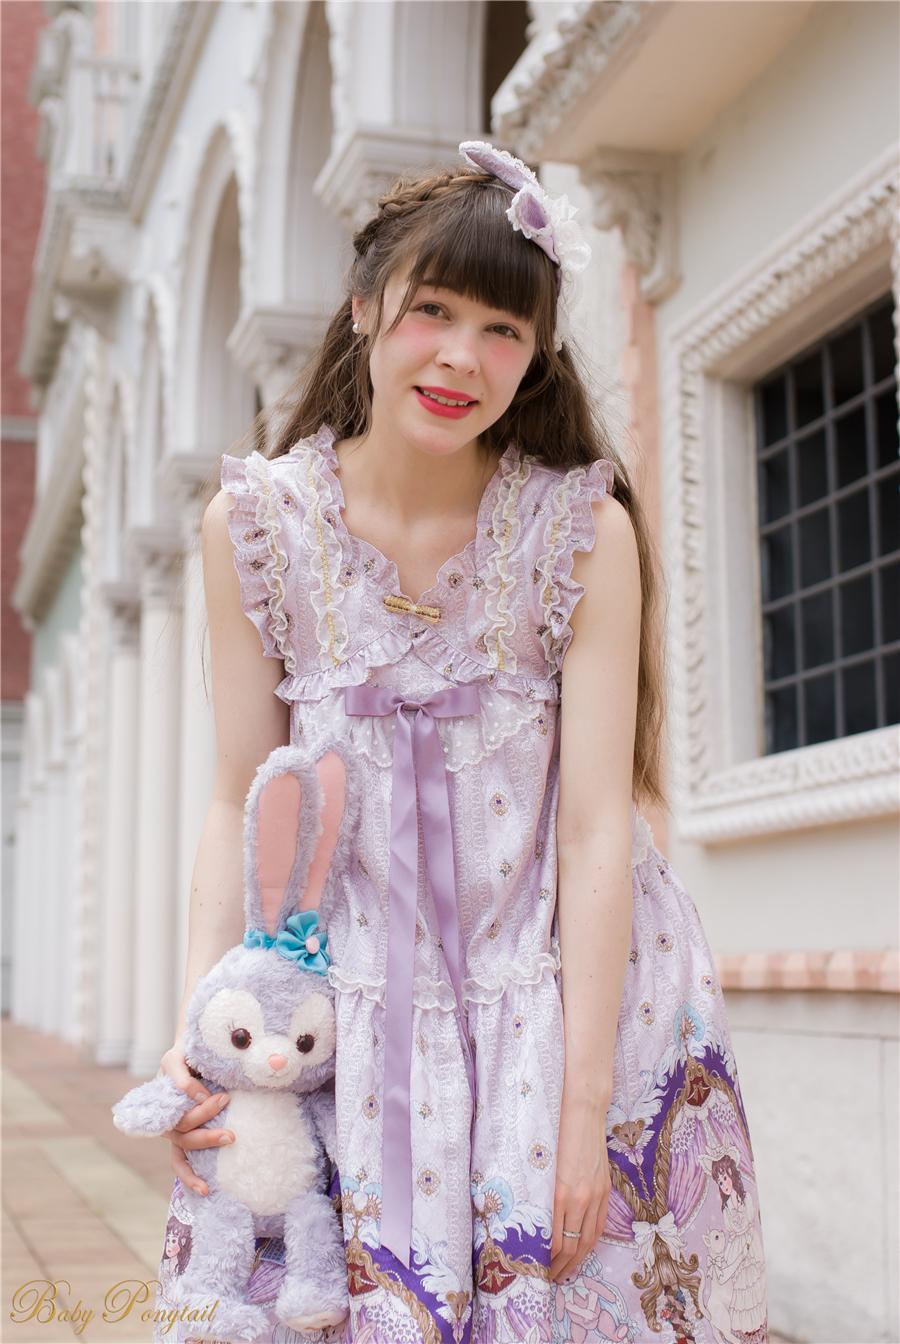 BabyPonytail_Model Preview_My Favorite Companion_Purple JSK_NG-1_Claudia_08.jpg